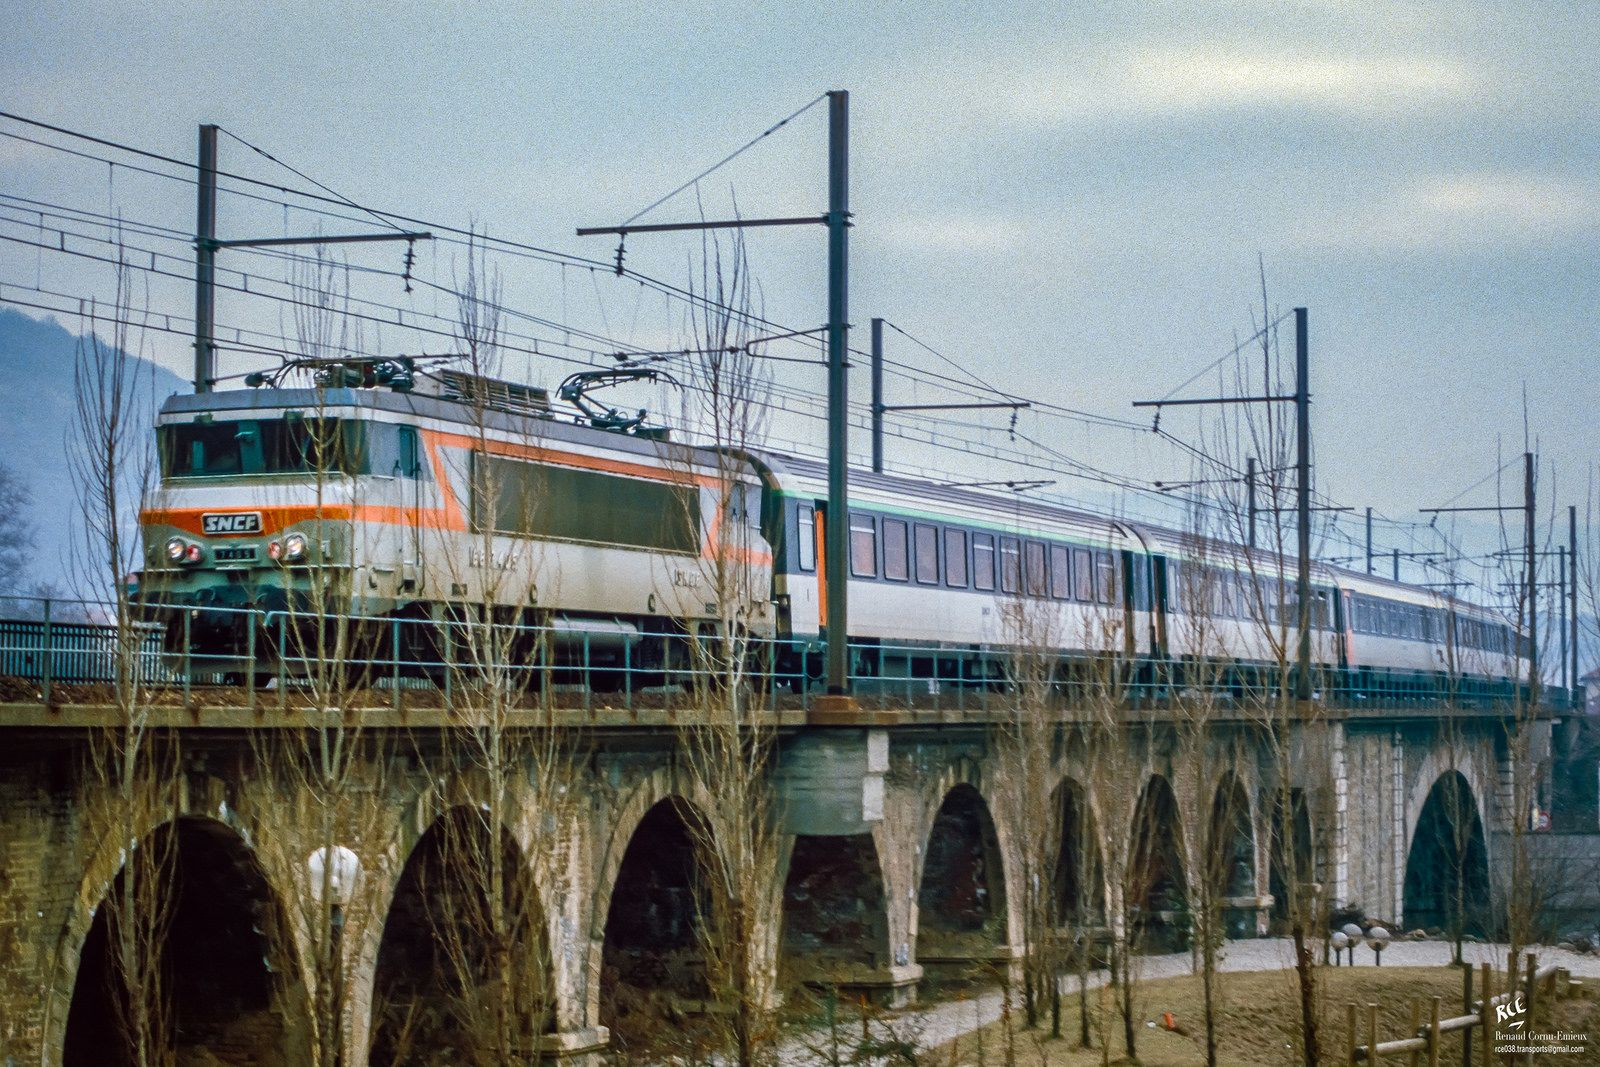 Rapide 5156/7 Nice Metz à St Vallier (26) Paris